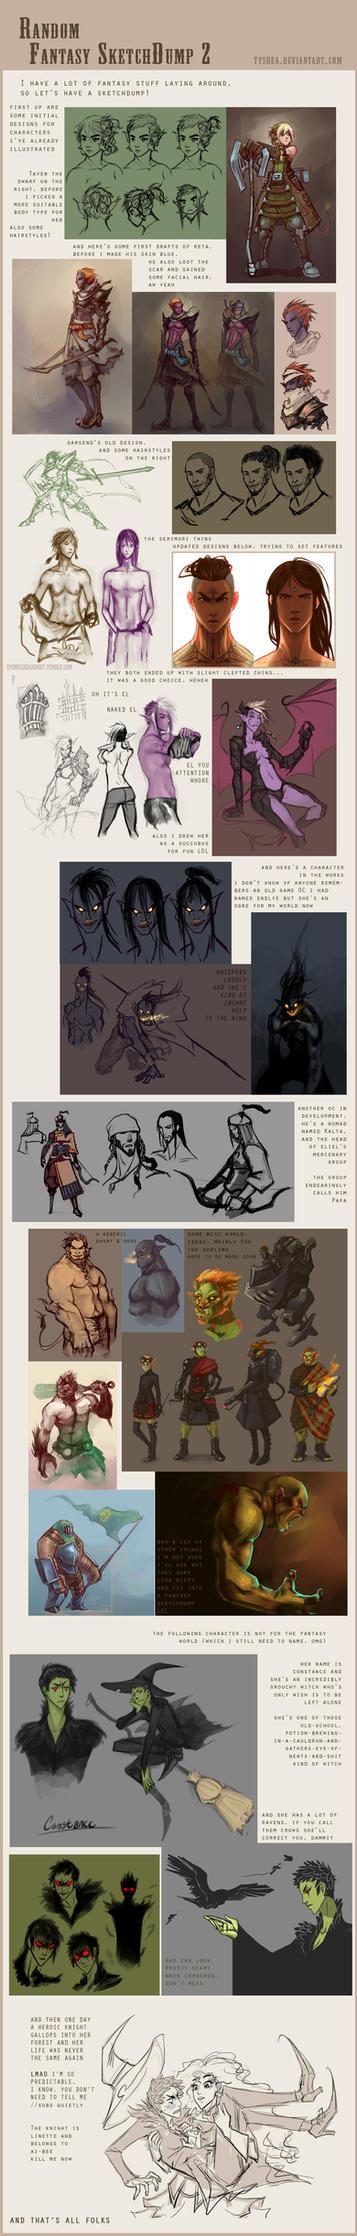 Fantasy Sketchdump by Dyemelikeasunset